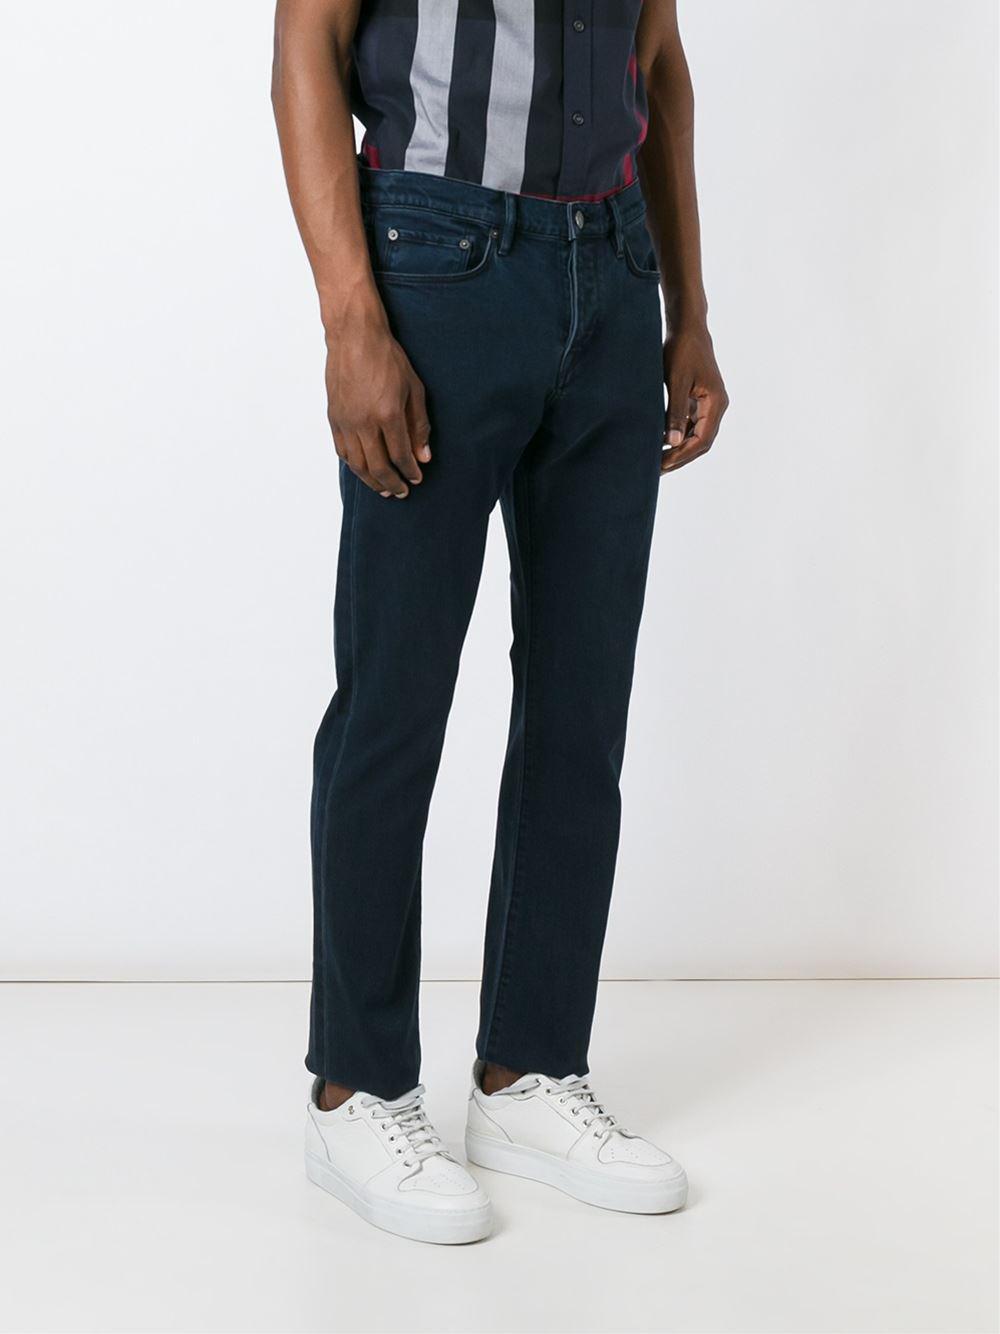 straight leg trousers - Blue Burberry 0lW1zD